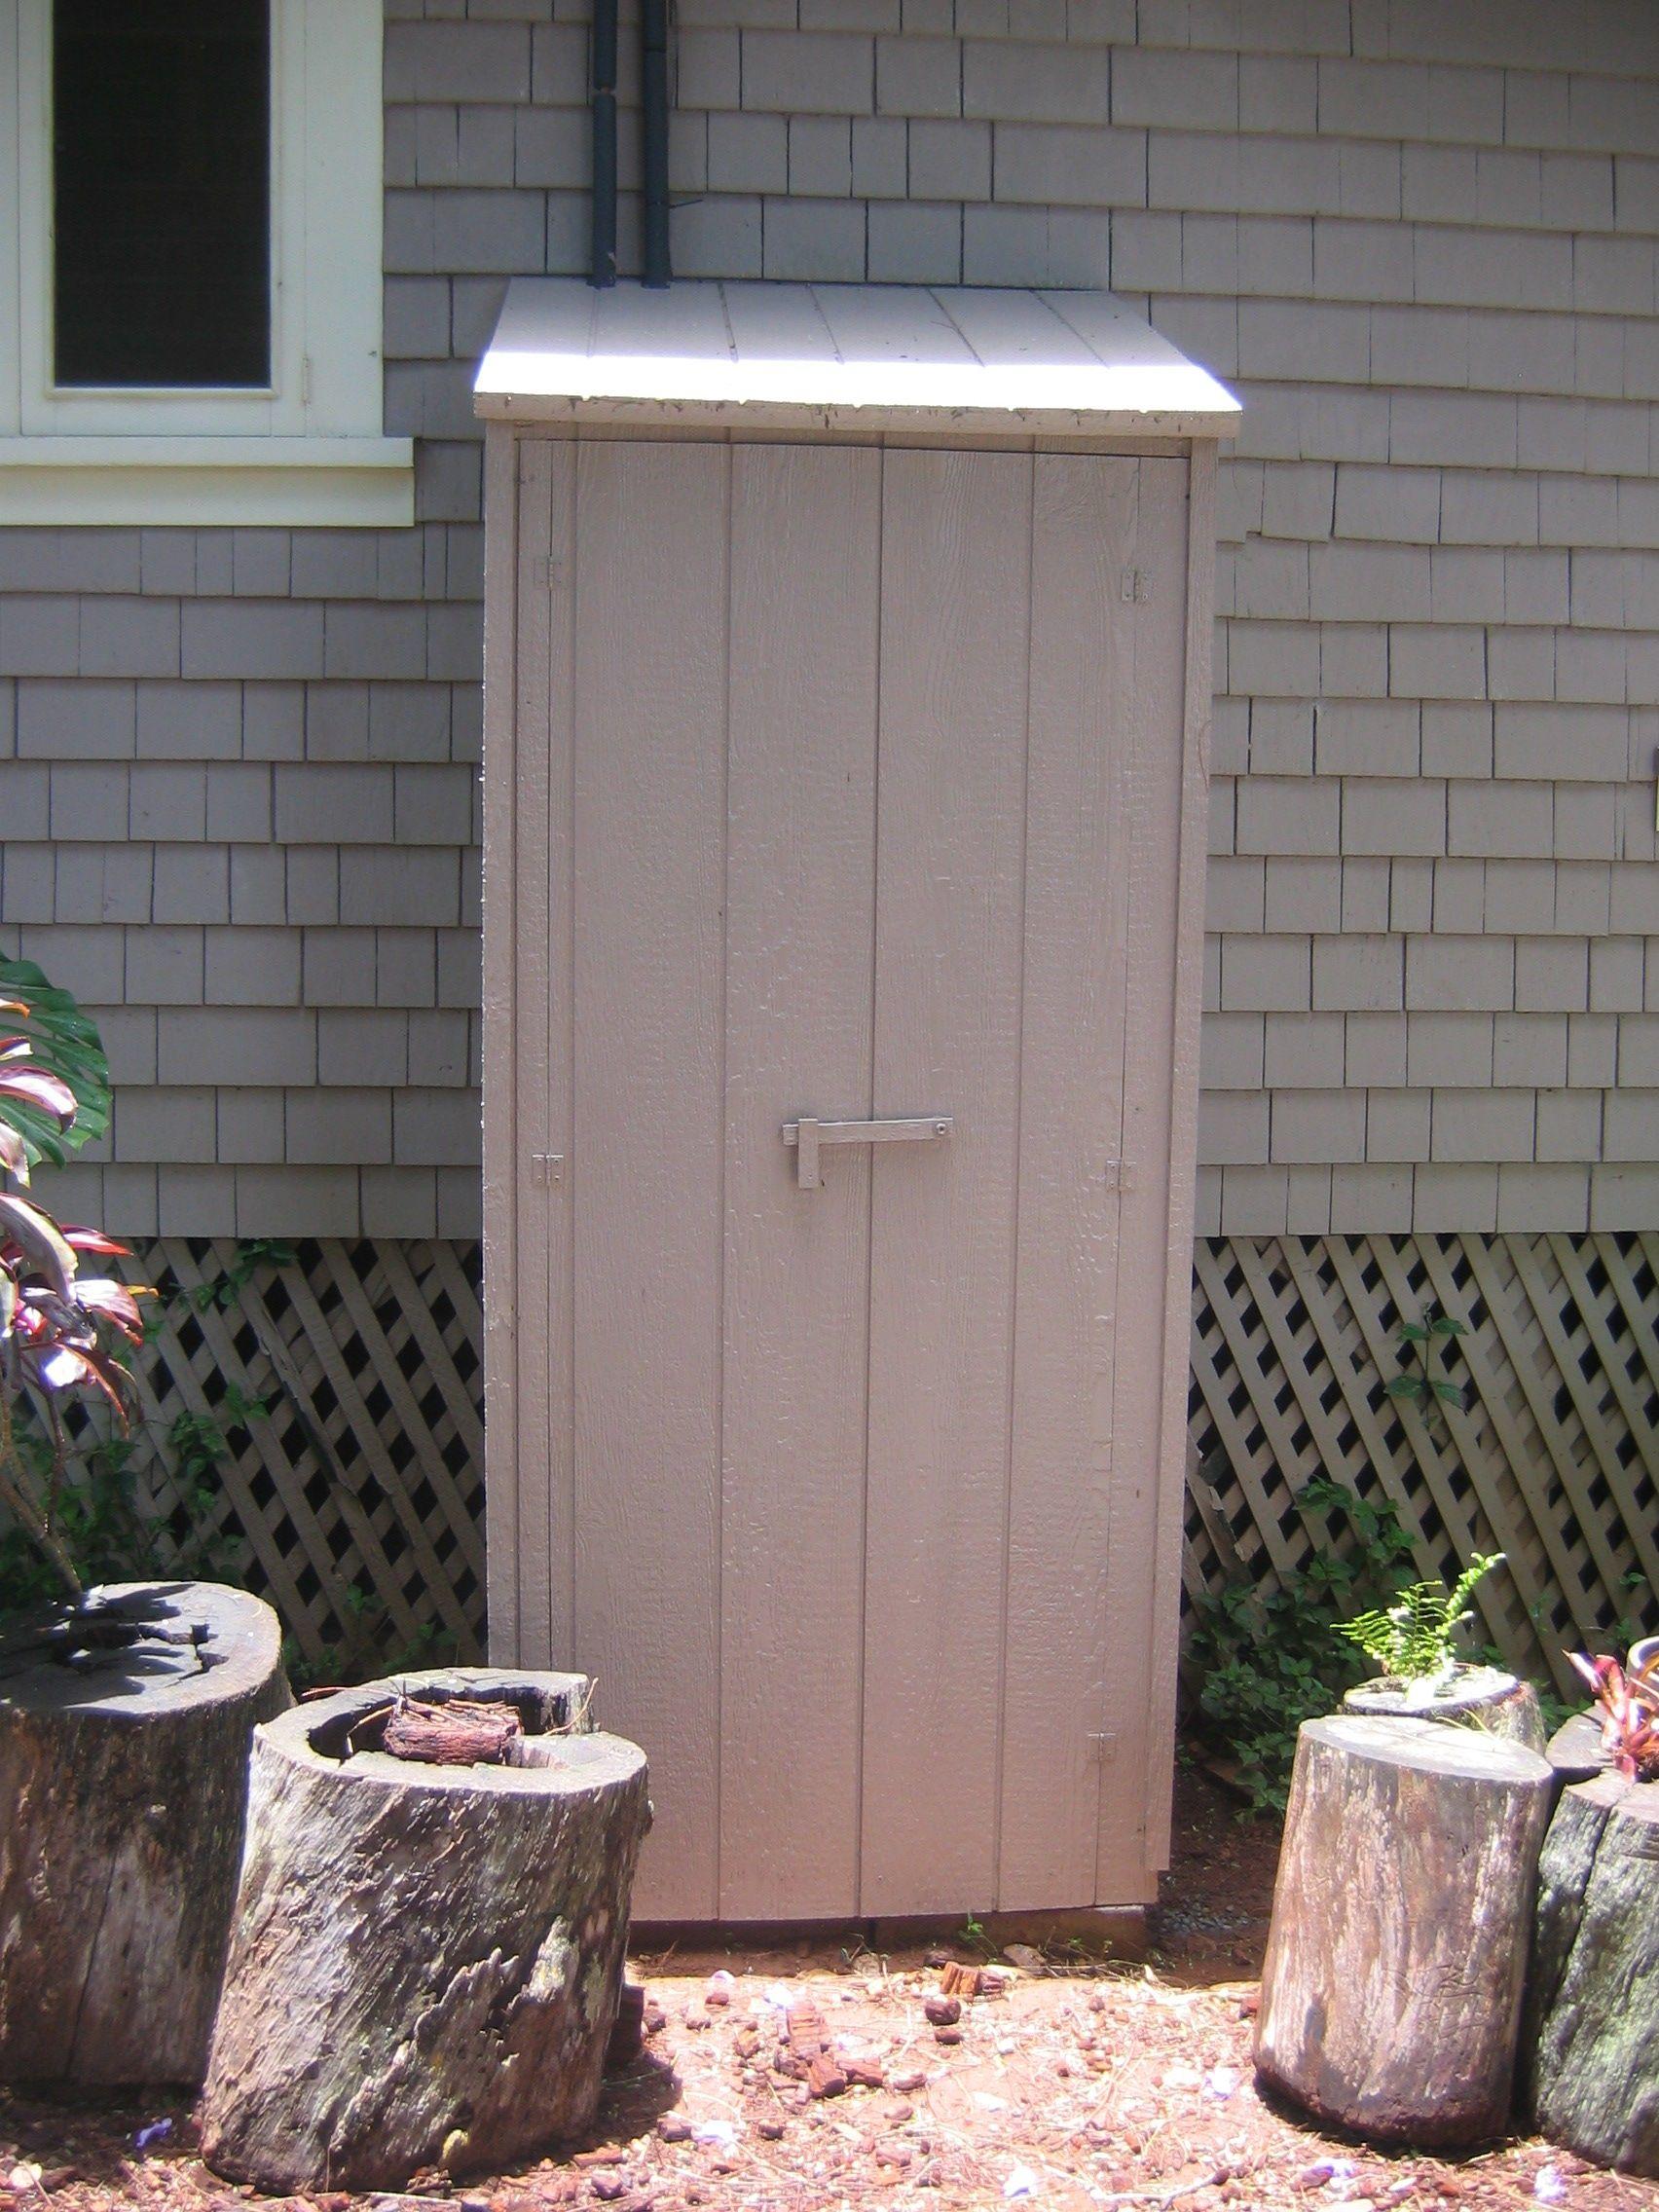 Hot Water Heater Enclosure Ideas : water, heater, enclosure, ideas, Water, Heater, Enclosure, Google, Search, Heater,, Cover,, Closet